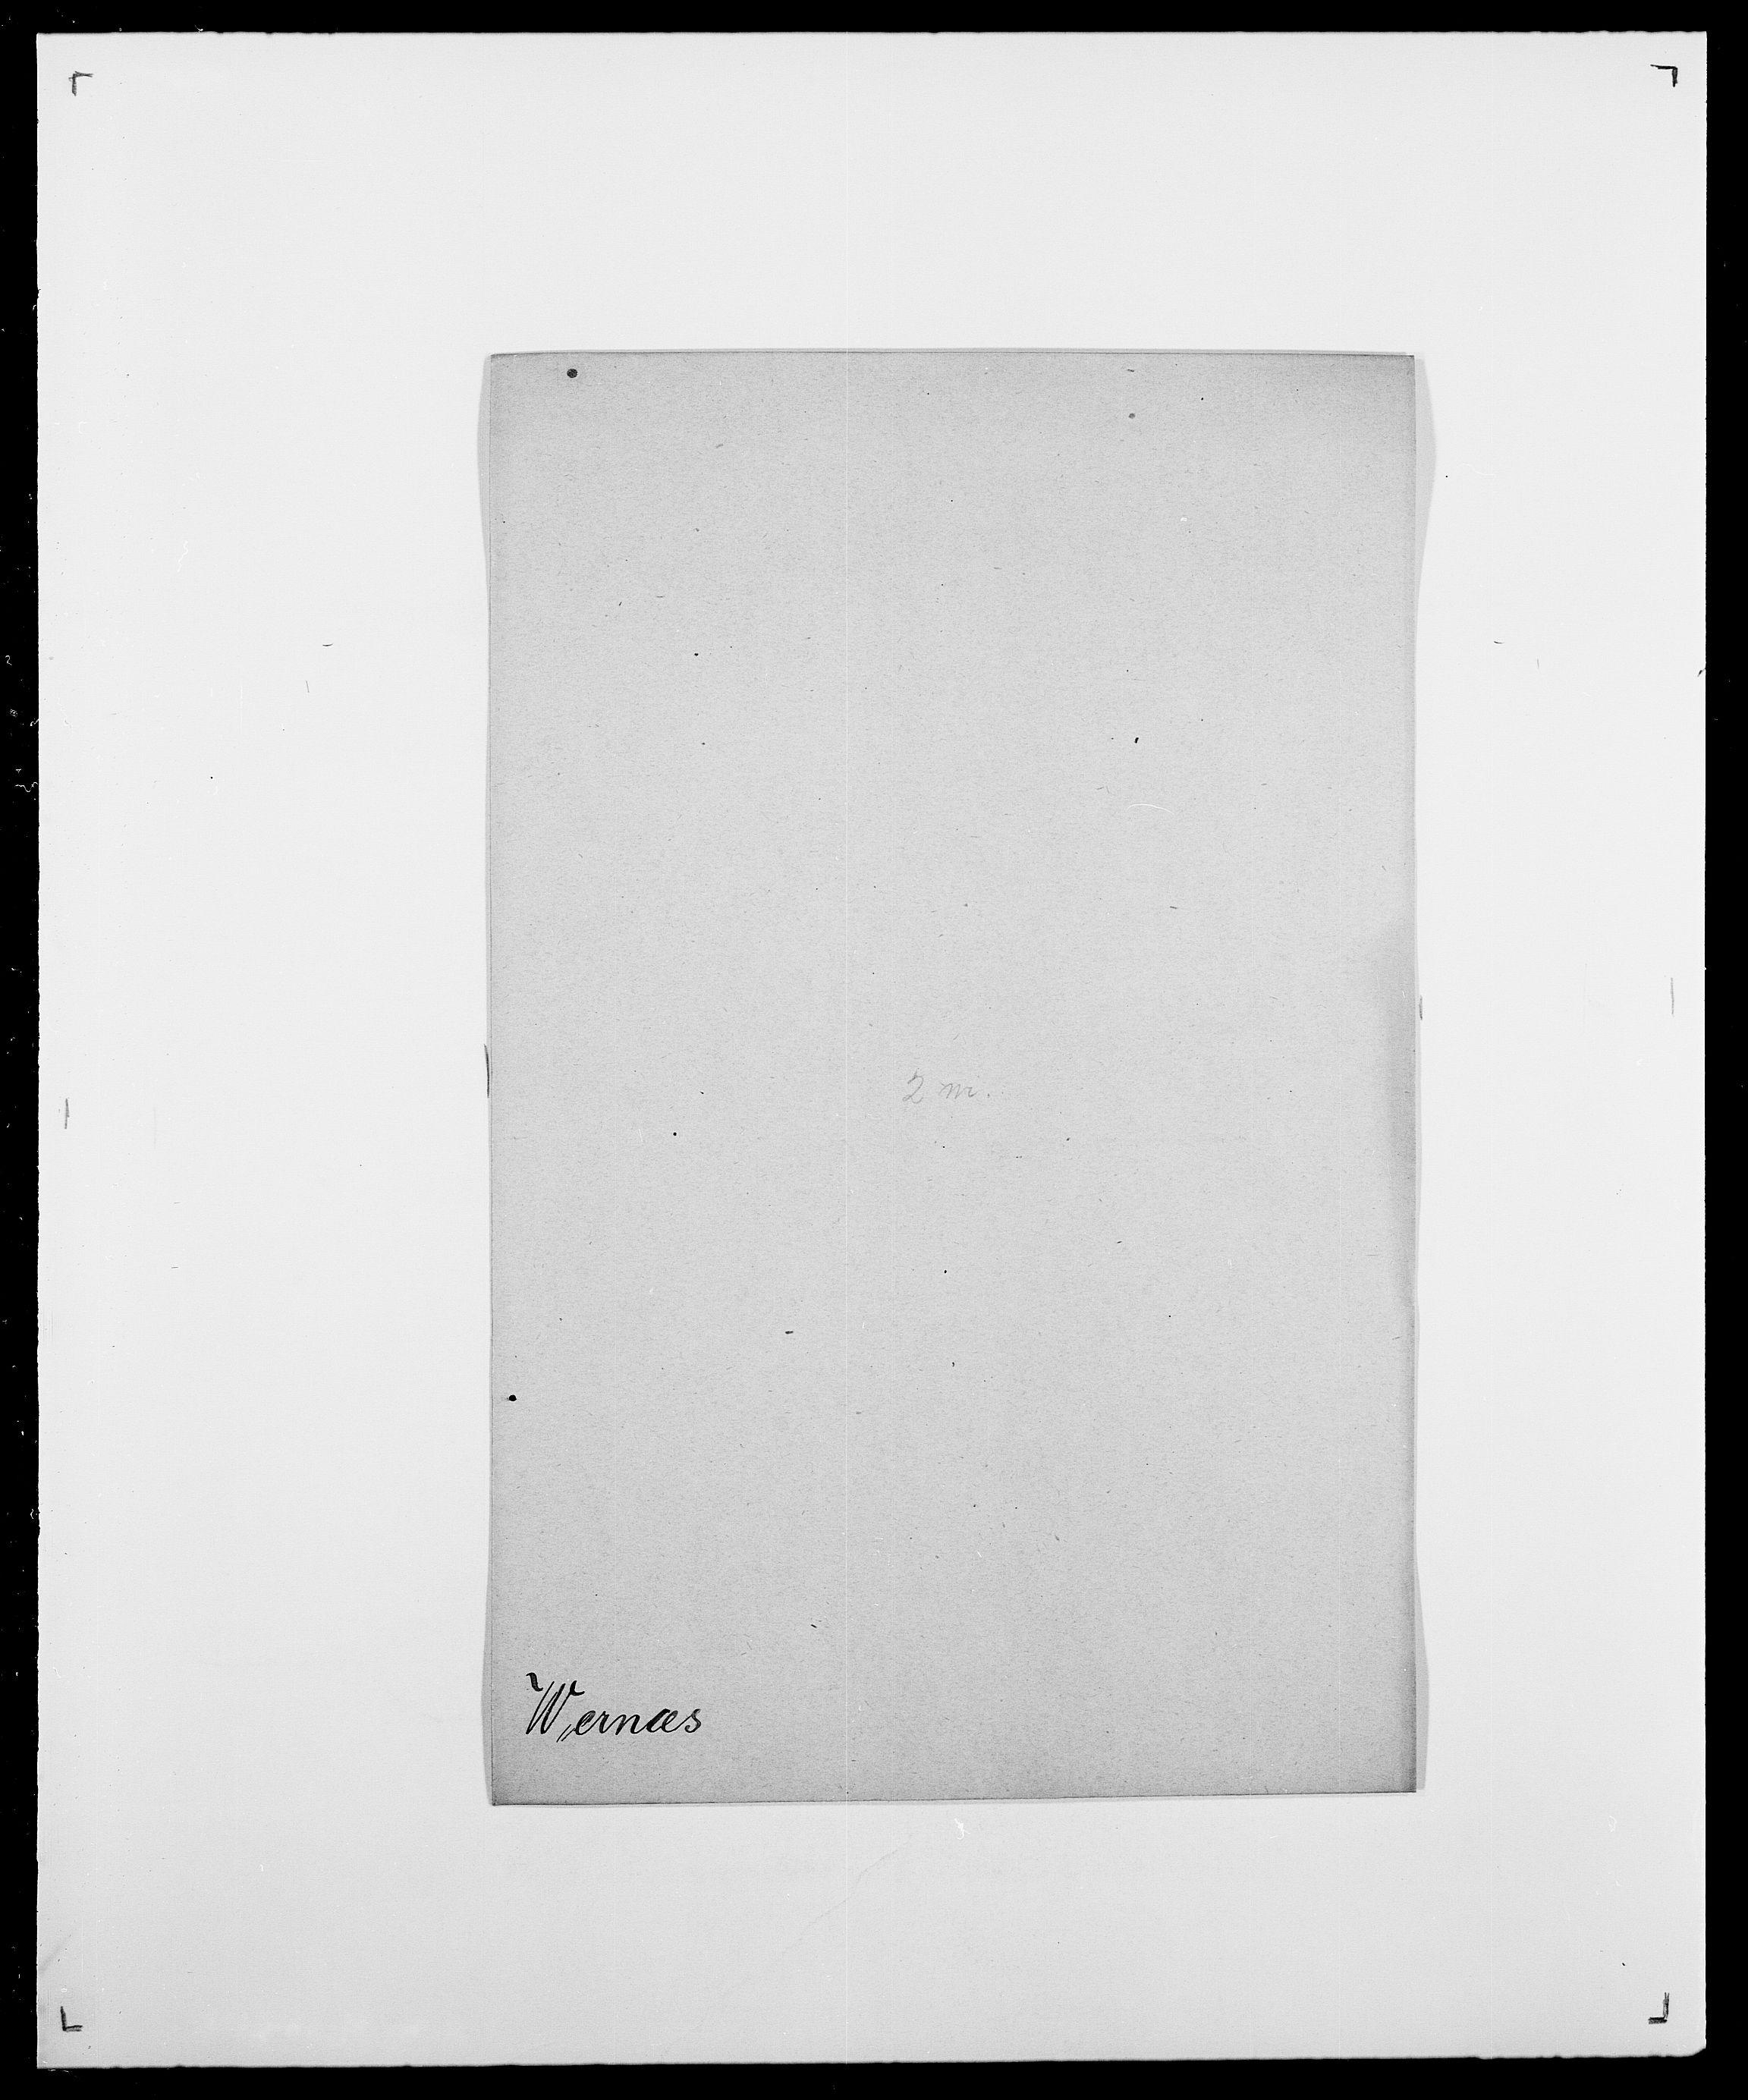 SAO, Delgobe, Charles Antoine - samling, D/Da/L0041: Vemmestad - Viker, s. 140